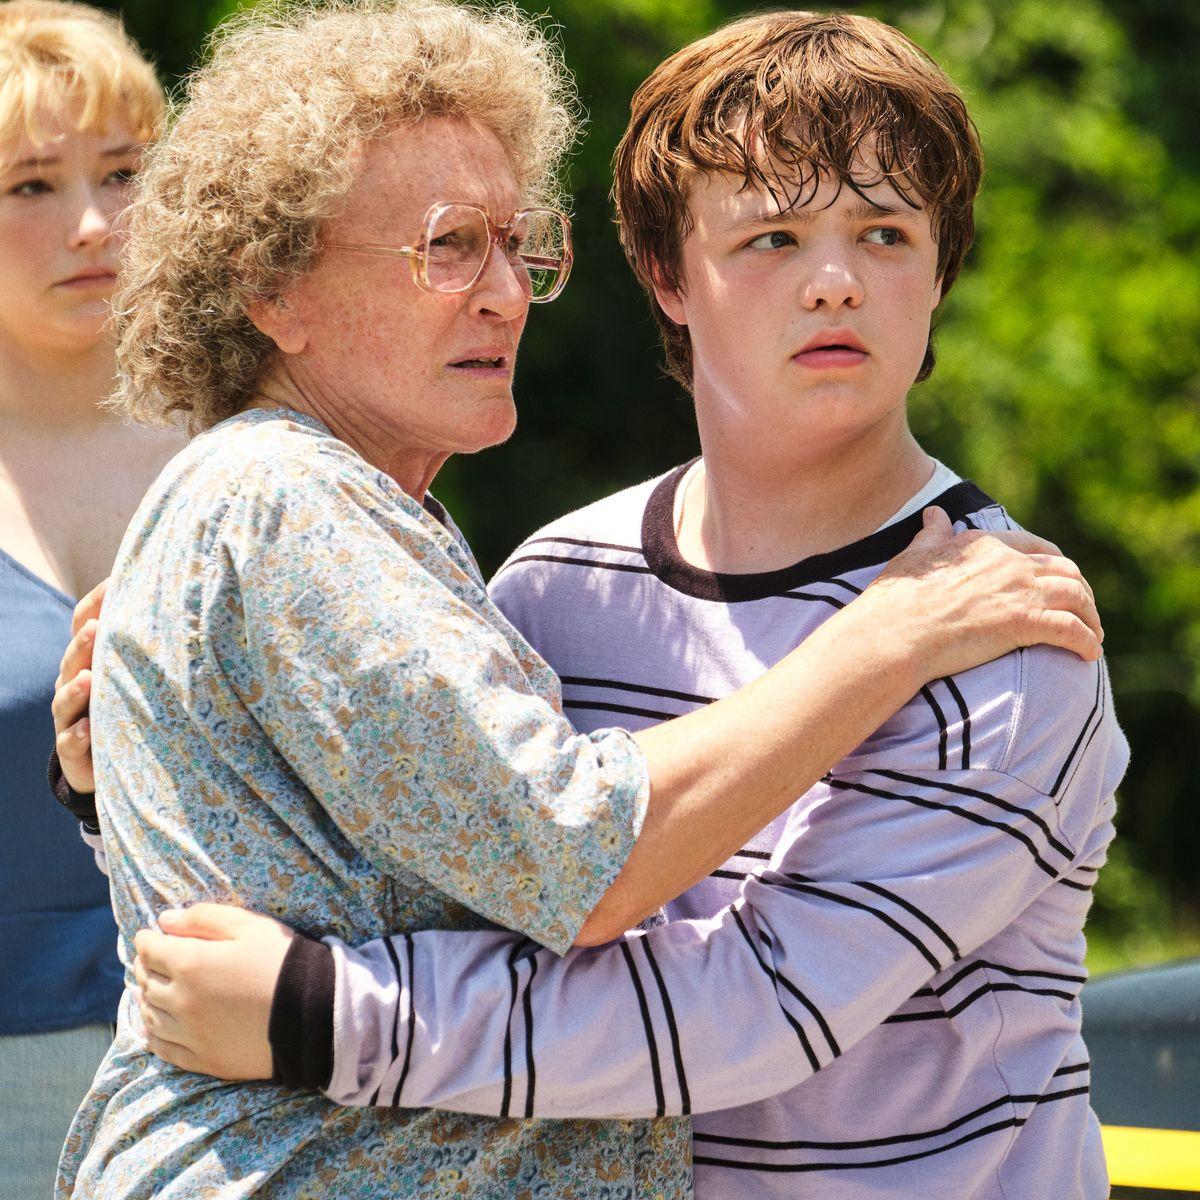 Review: Hillbilly Elegy, starring Amy Adams and Glenn Close